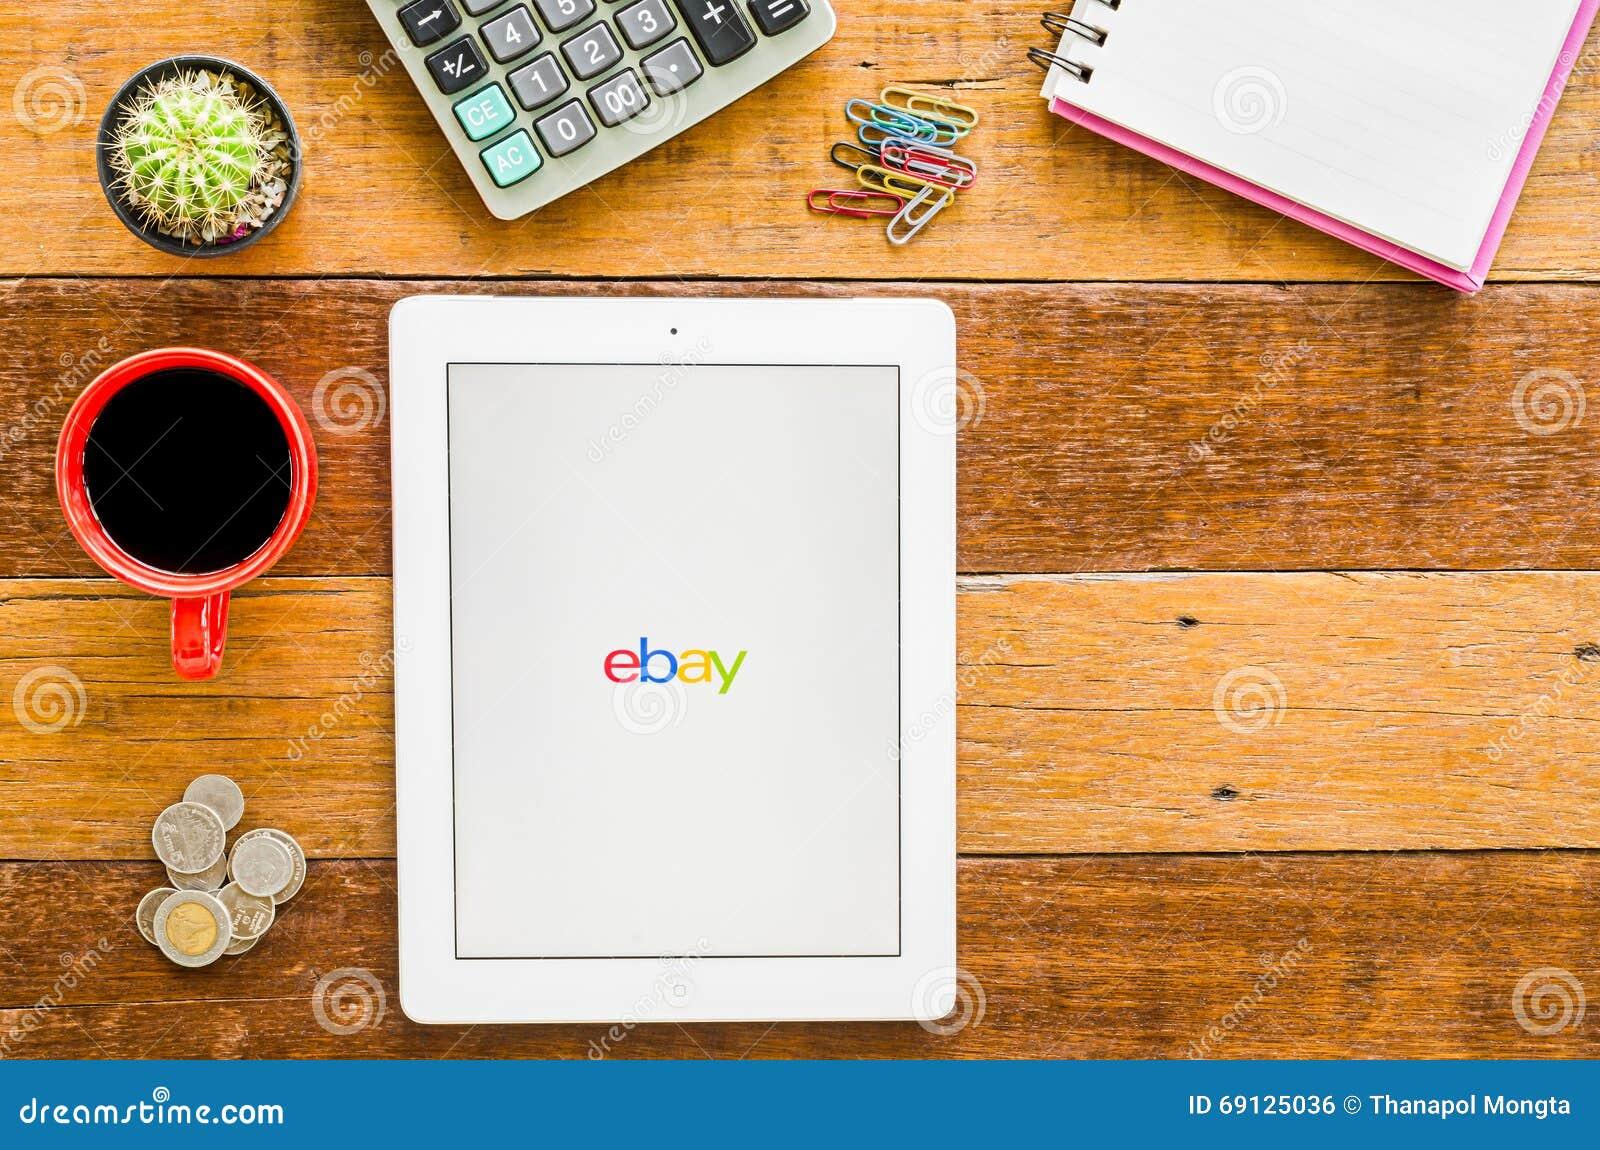 IPad 4 öppna ebay apps